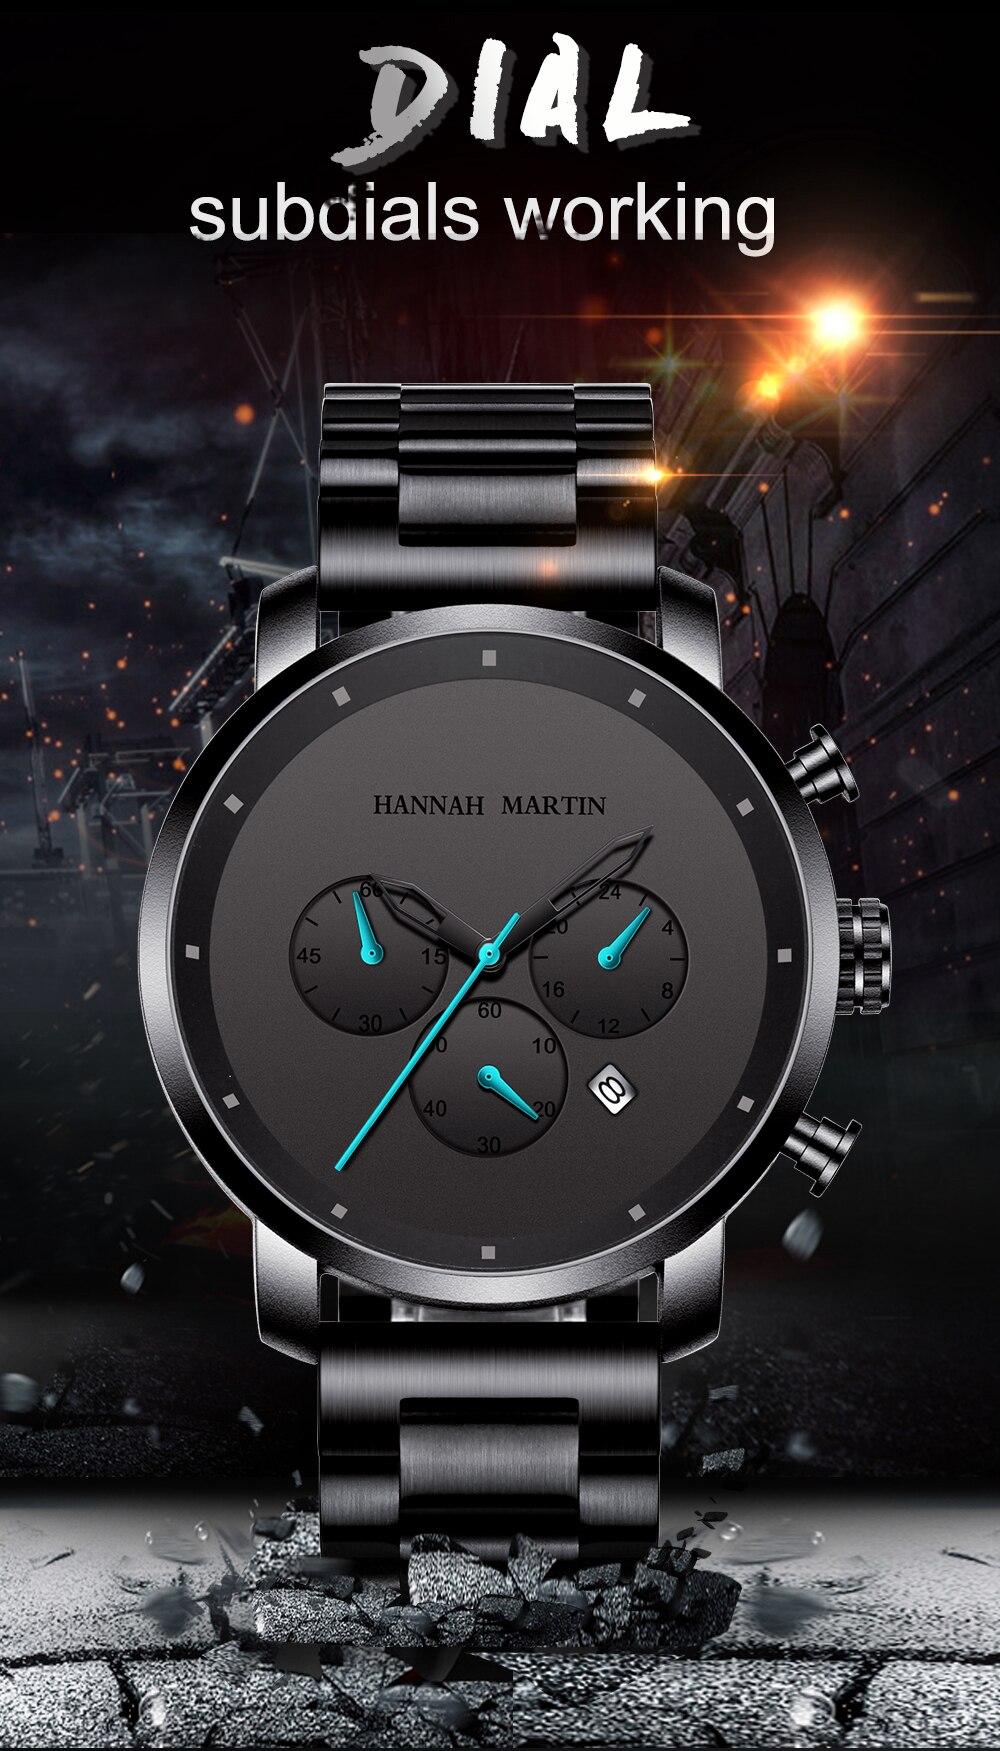 Hb43ceb3e04fa46108a986d1a057c2c97D DropShipping Big Dial 45mm Full Black Stainless Steel Multi-function Calendar Men's Top Brand Luxury Watches Relogio Masculino